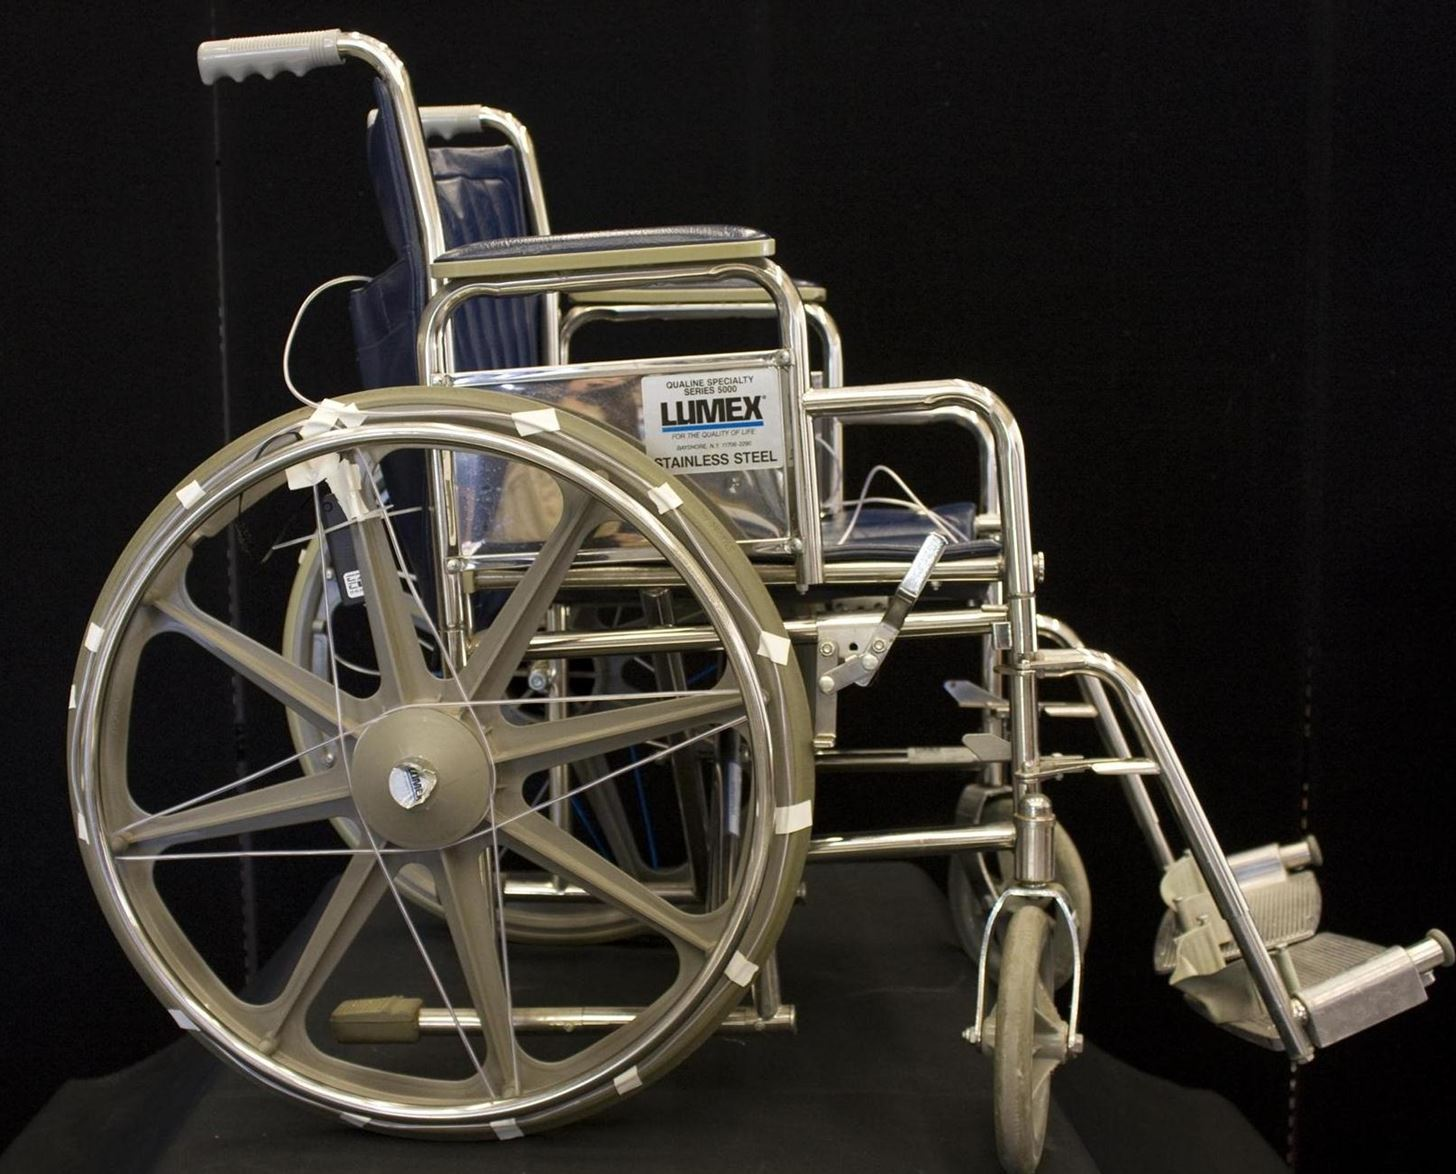 illuminate wheelchair for safety using el wire led strip.w1456?resize=665%2C536&ssl=1 ez lock wheelchair wiring diagram wiring diagram ez lock wheelchair wiring diagram at eliteediting.co